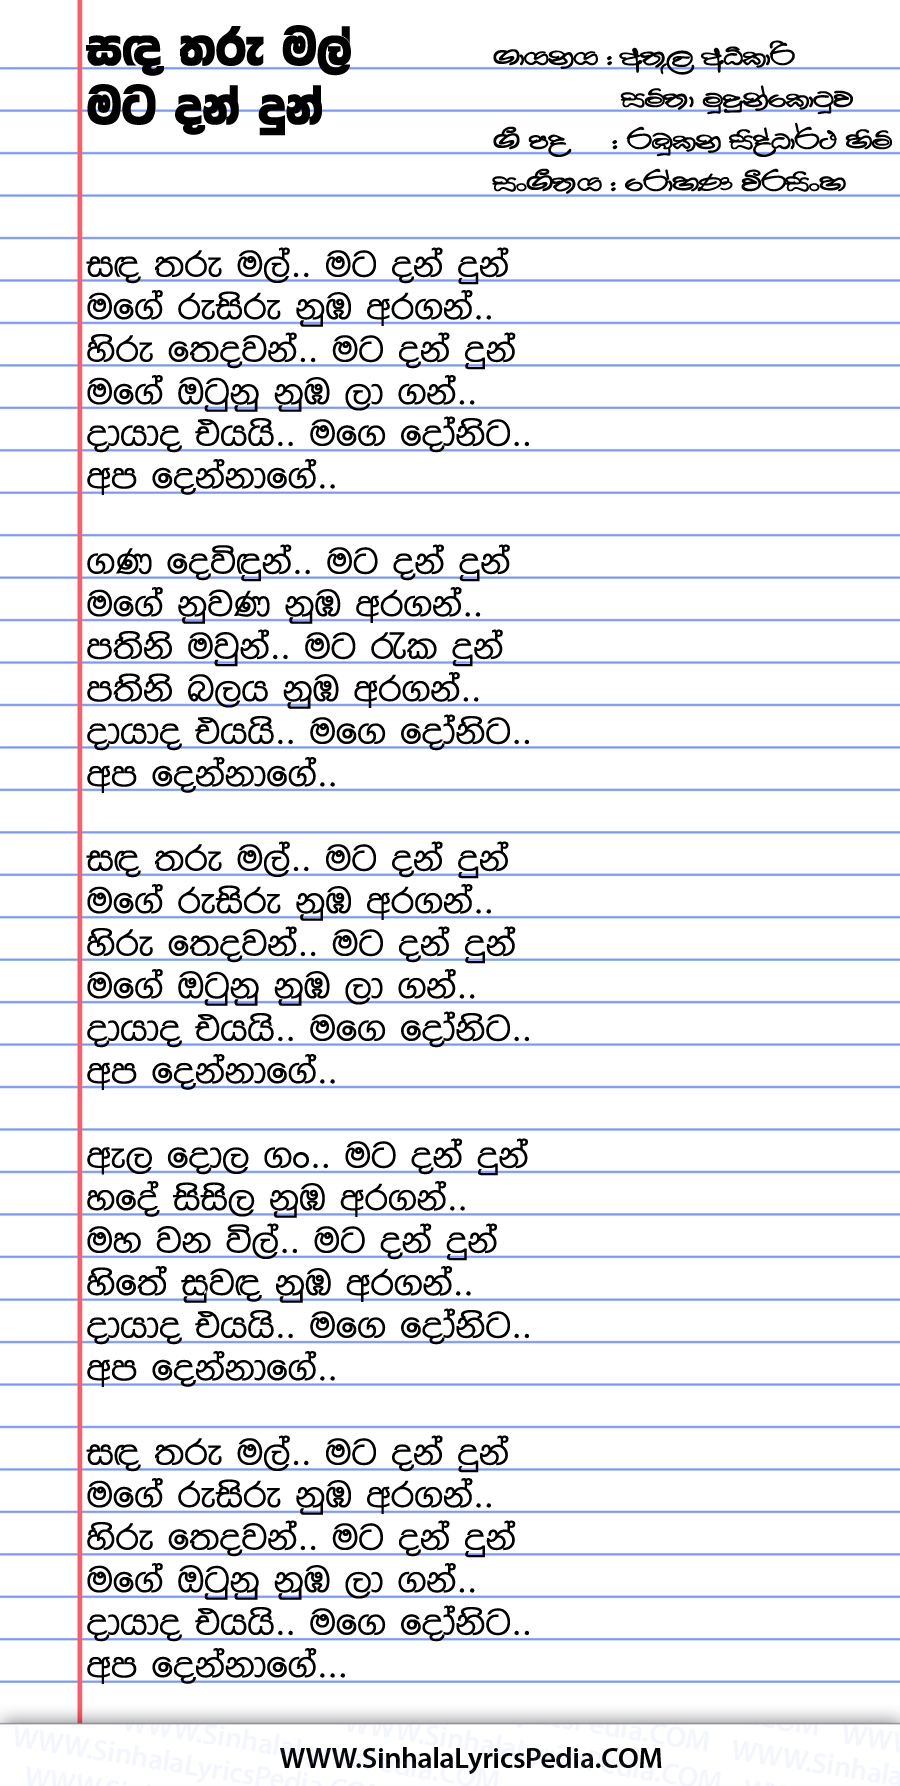 Sanda Tharu Mal Mata Dan Dun Song Lyrics